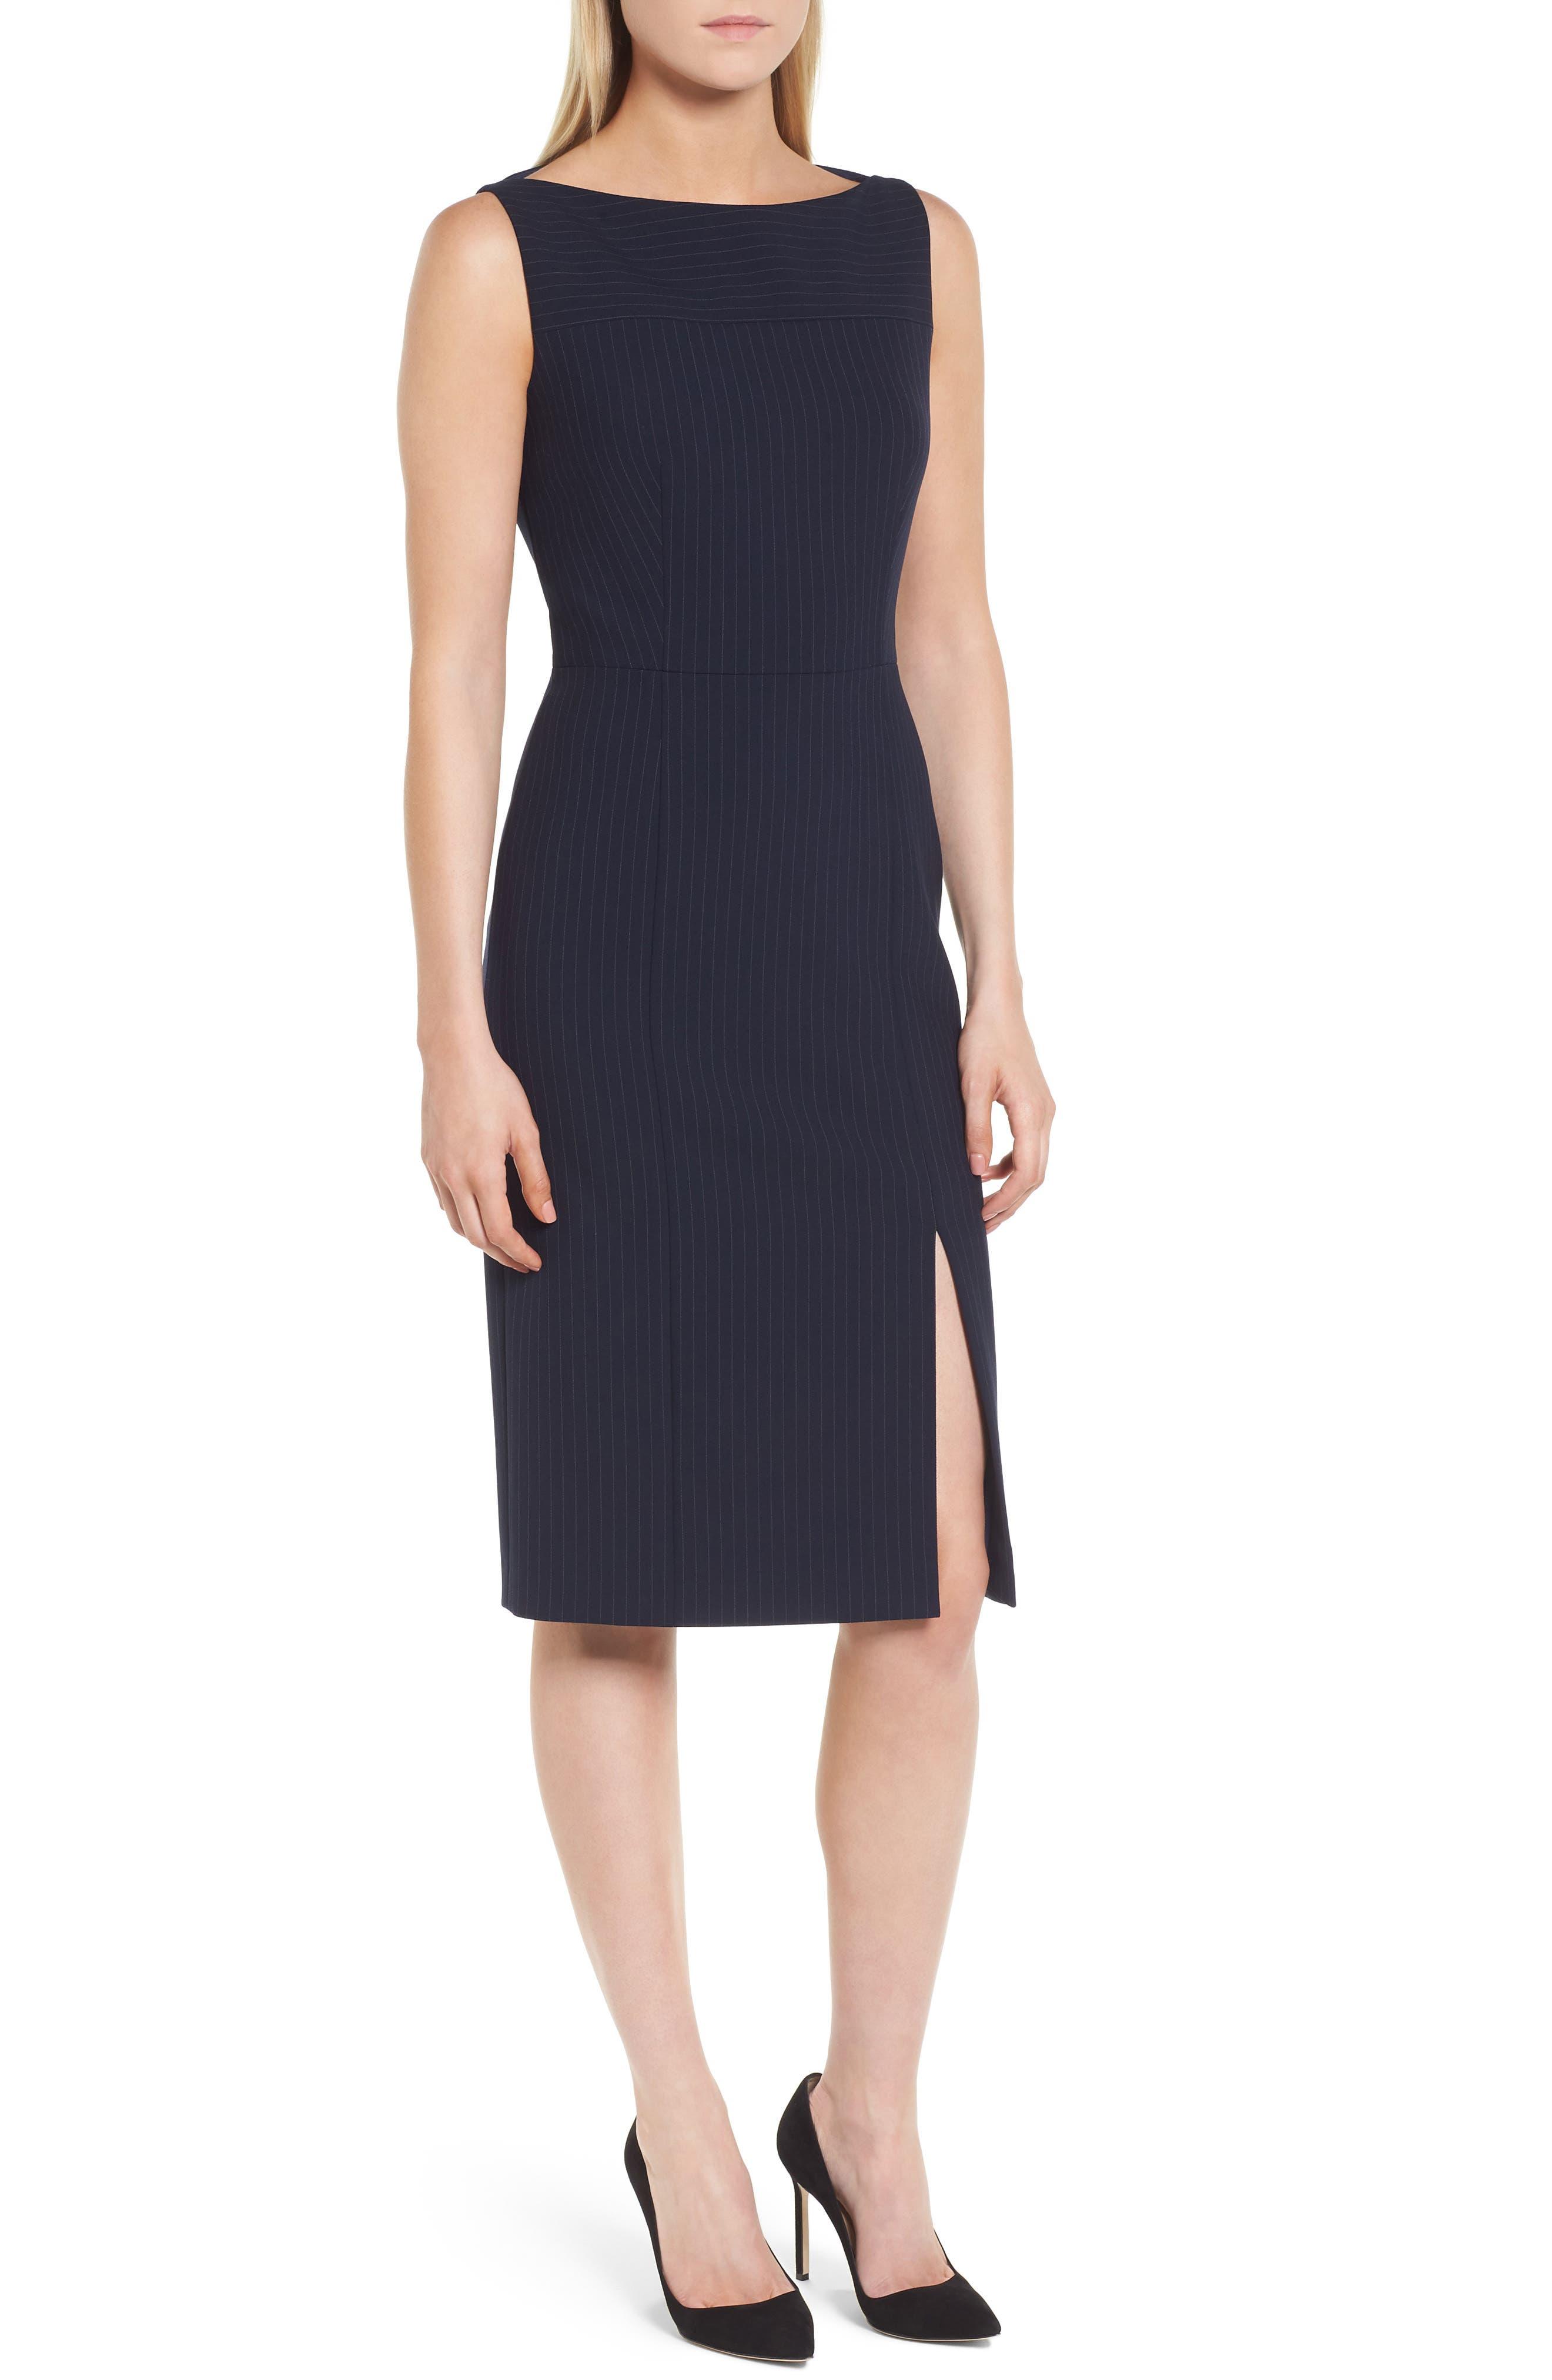 Denaka Pinstripe Sheath Dress,                             Main thumbnail 1, color,